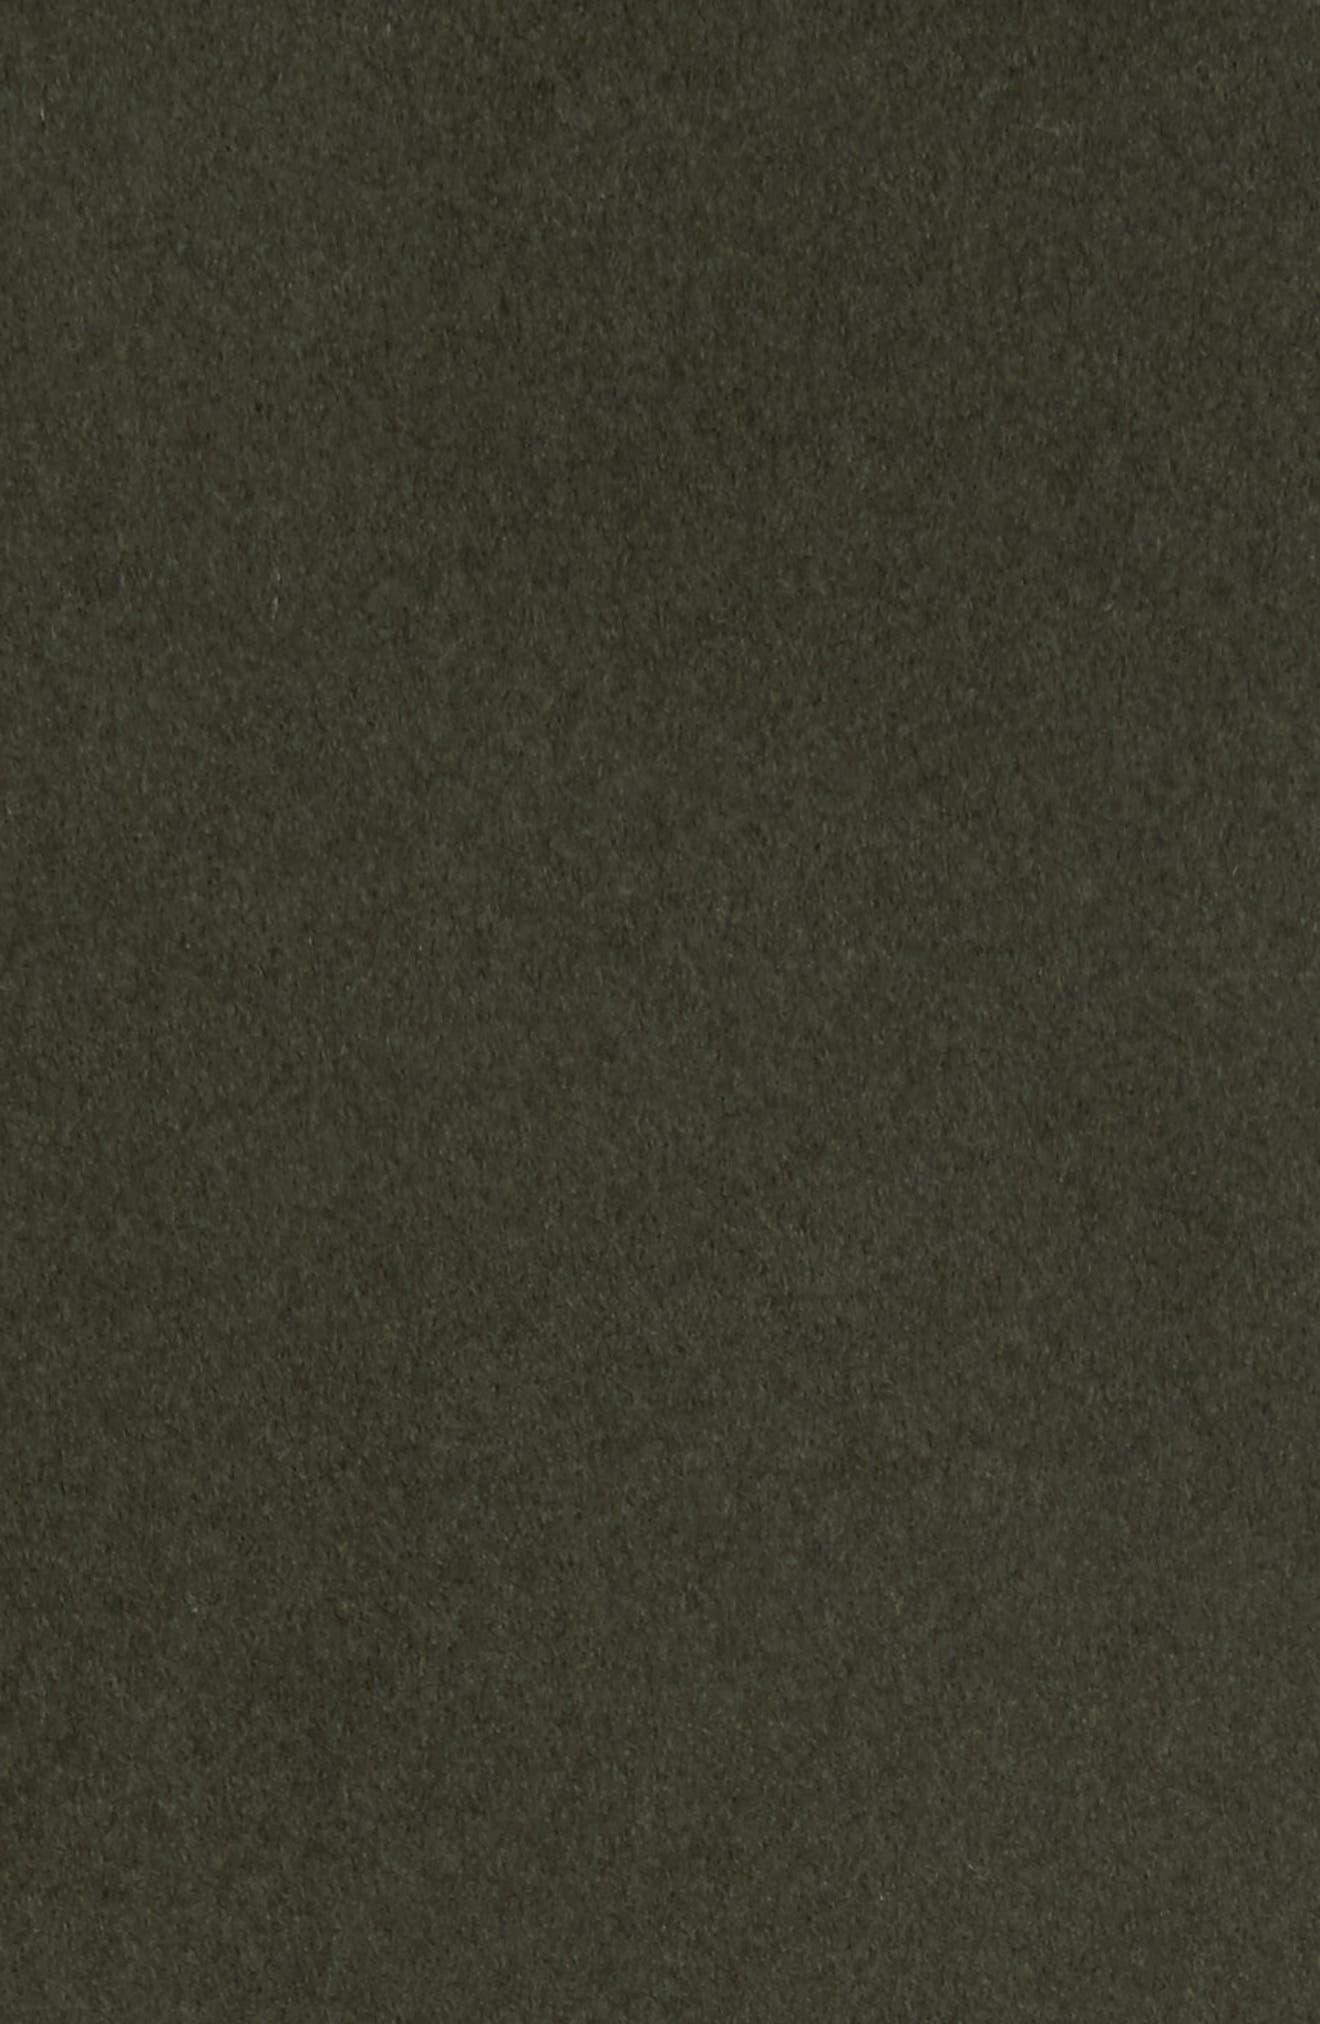 Bower Melton Wool Blend Topcoat,                             Alternate thumbnail 17, color,